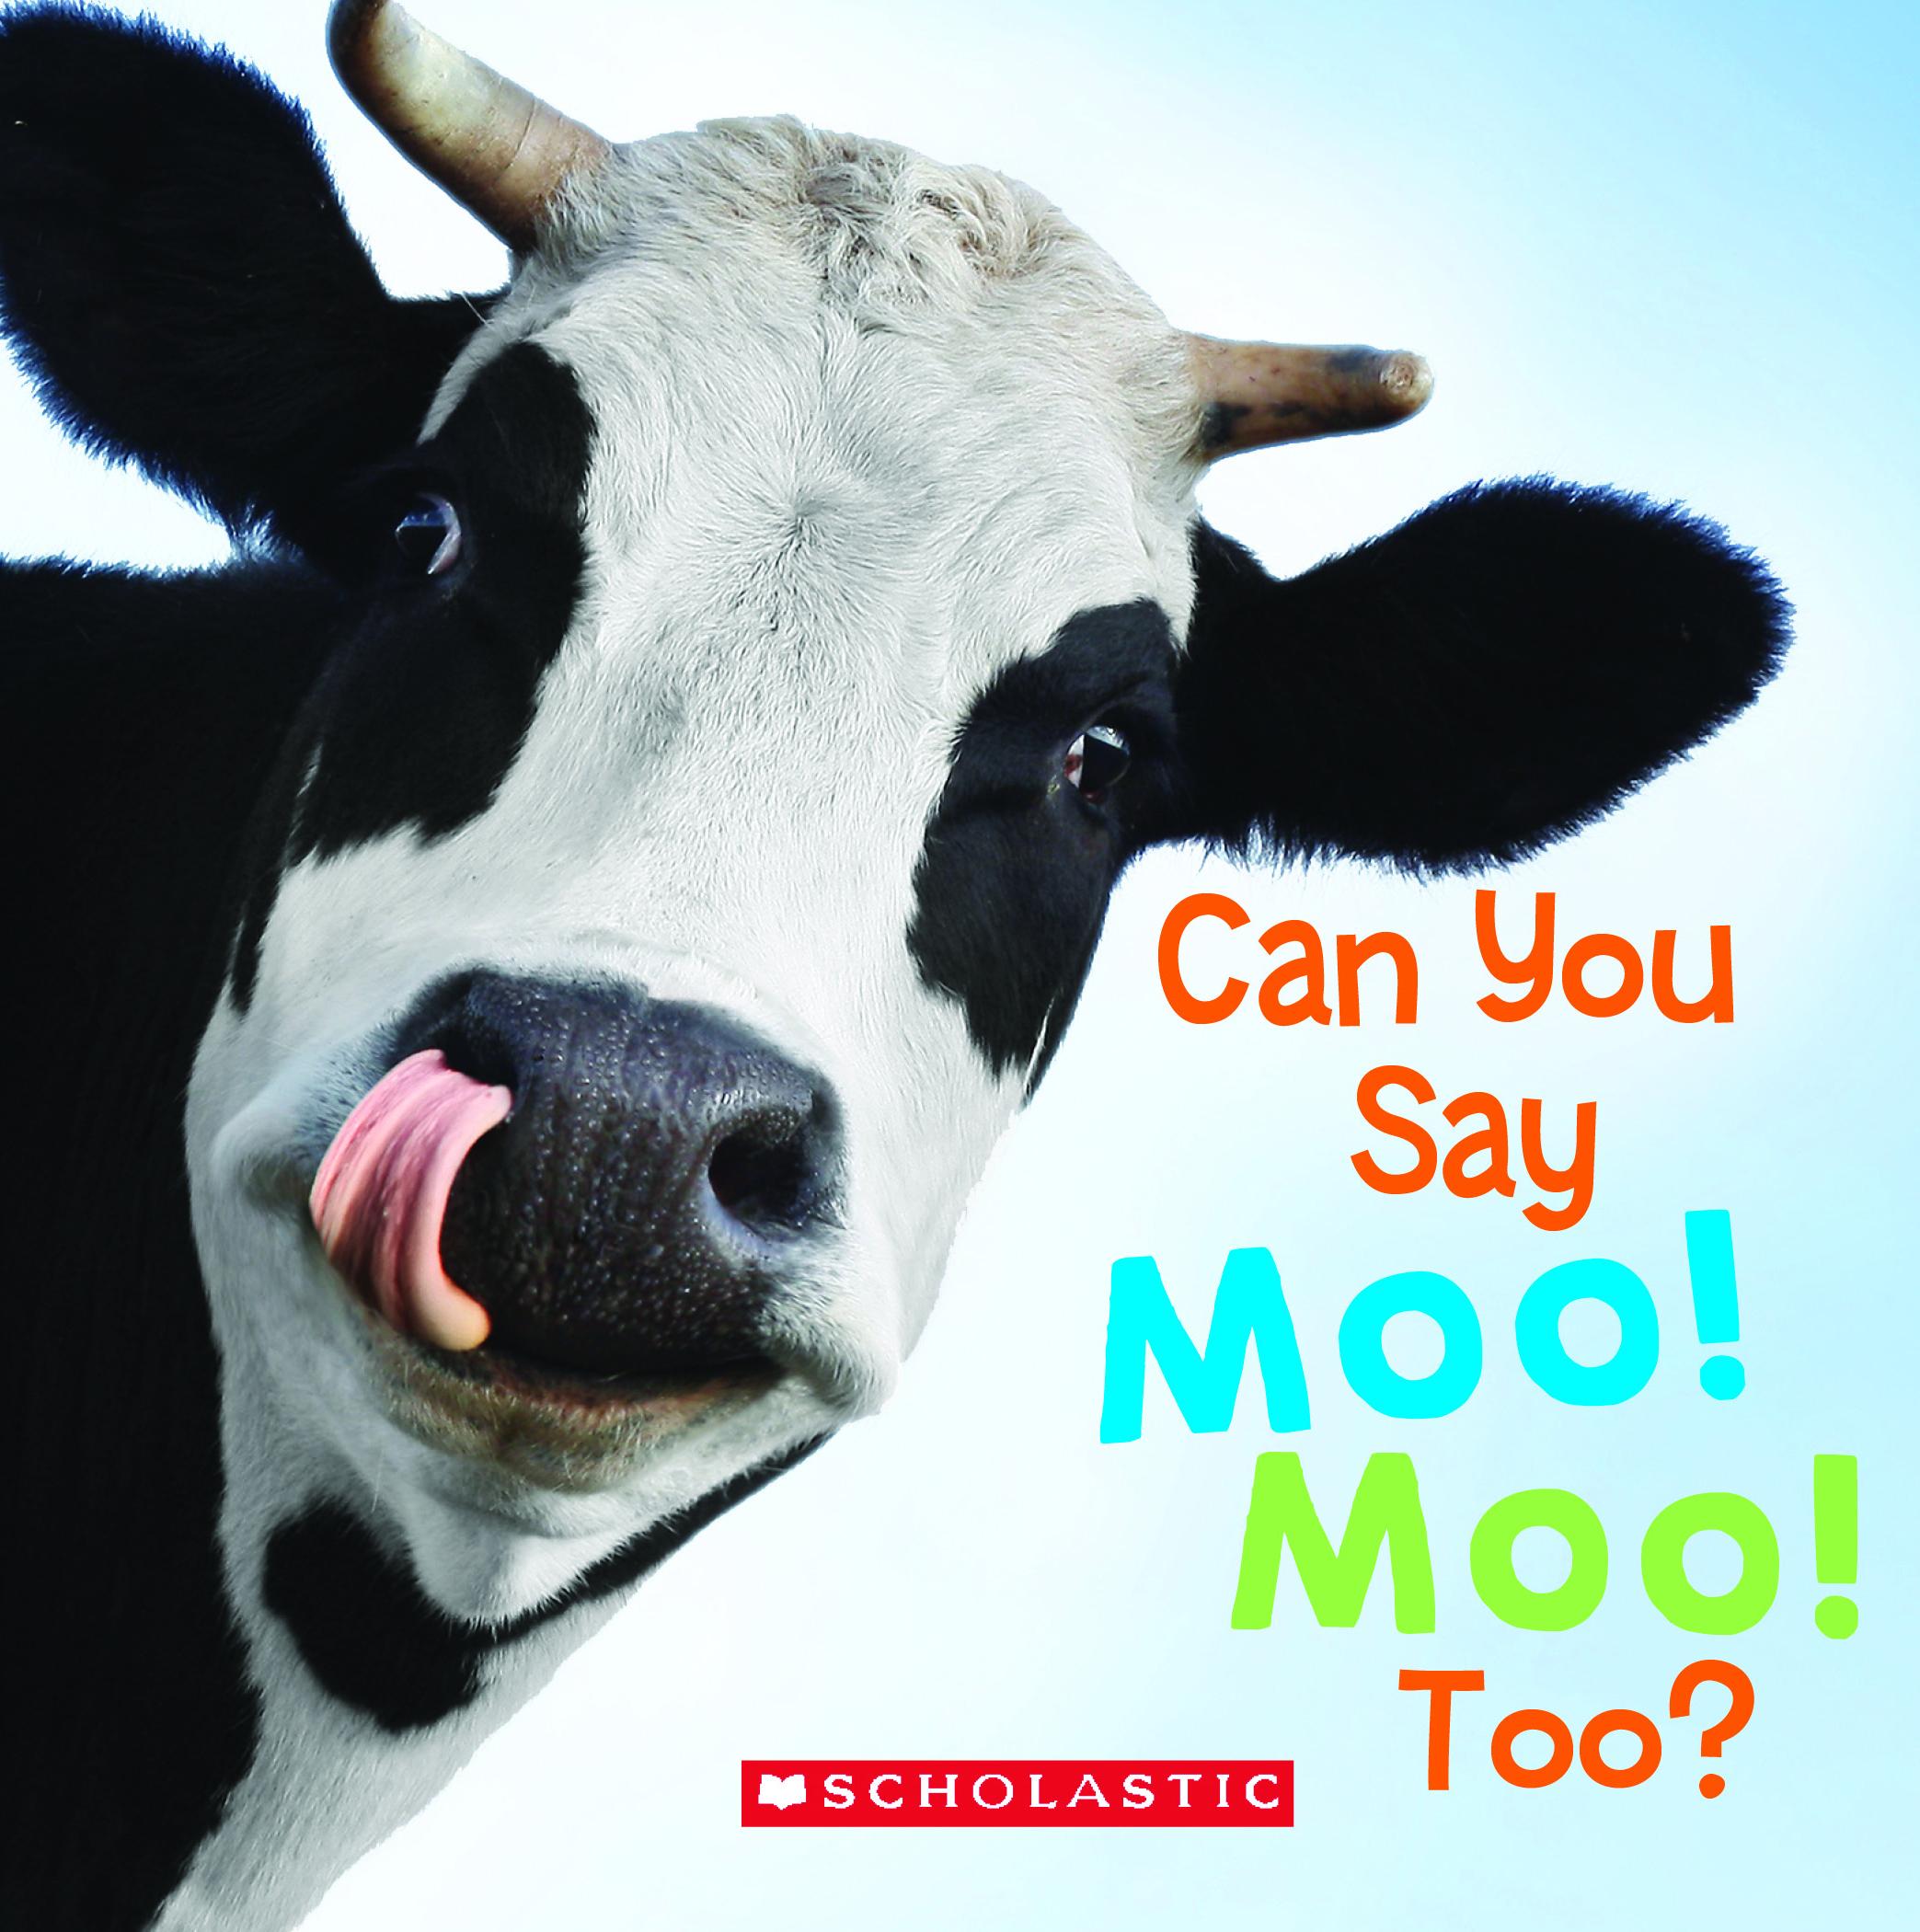 Can You Say Moo moo too